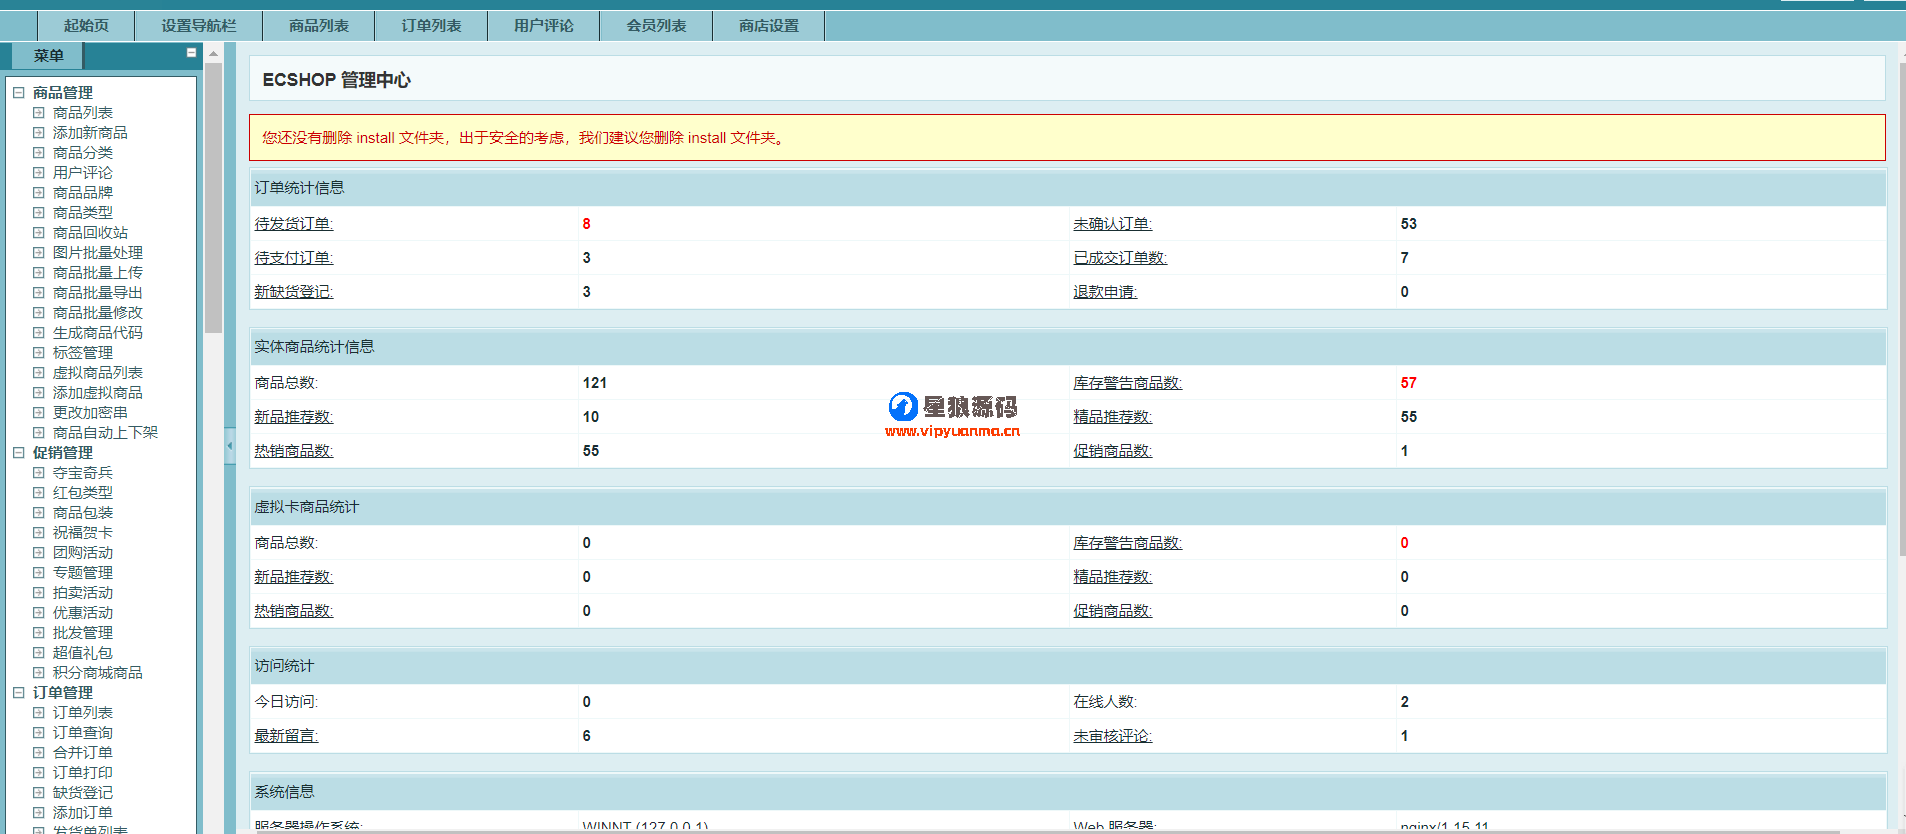 ecshop仿苏宁易购程序v1.0带全部数据完美可用可运营(星狼已测试) 第2张